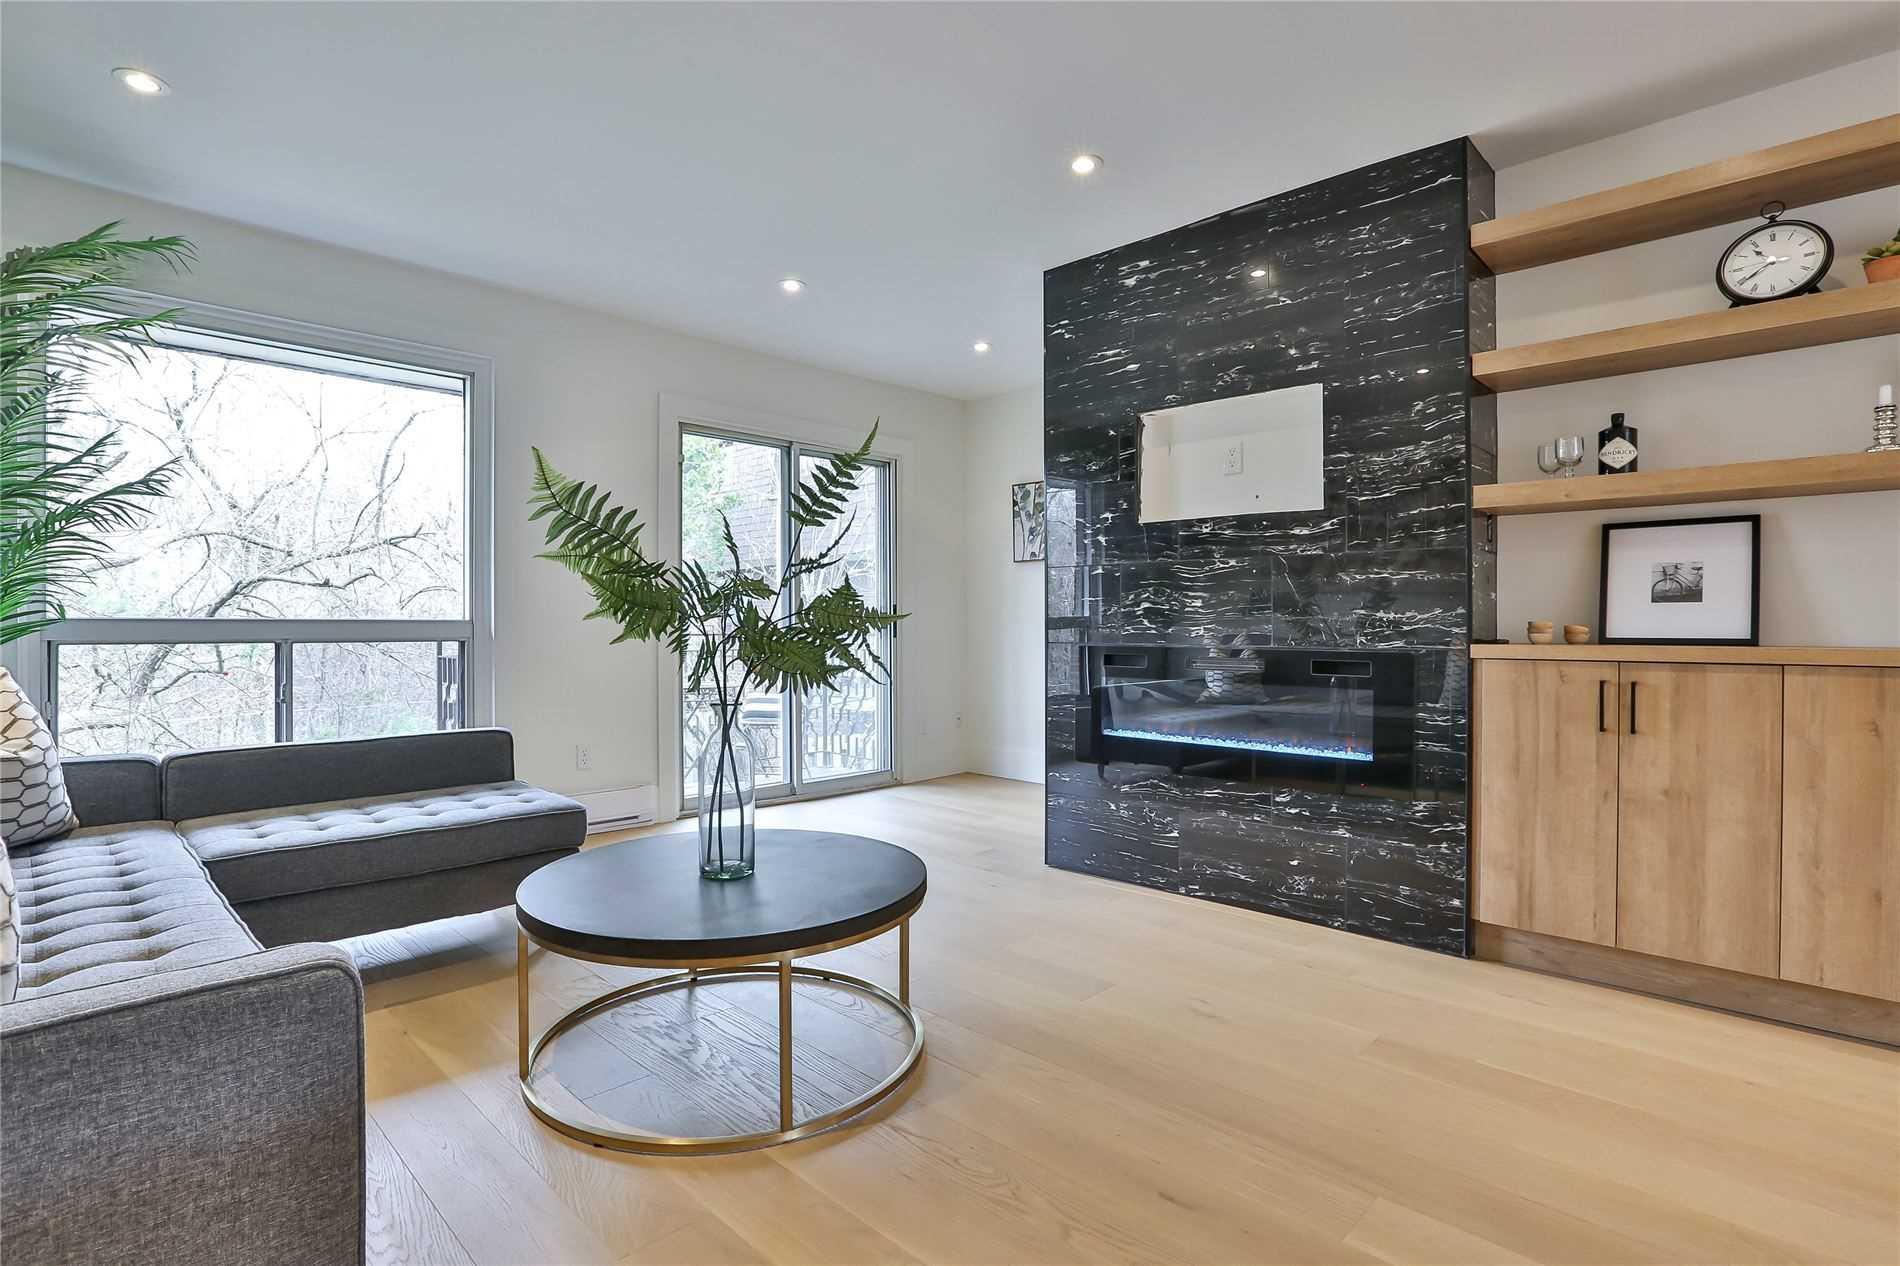 100 Henderson Ave, Markham, Ontario L3T2K8, 3 Bedrooms Bedrooms, ,3 BathroomsBathrooms,Condo Townhouse,For Sale,Henderson,N5188649